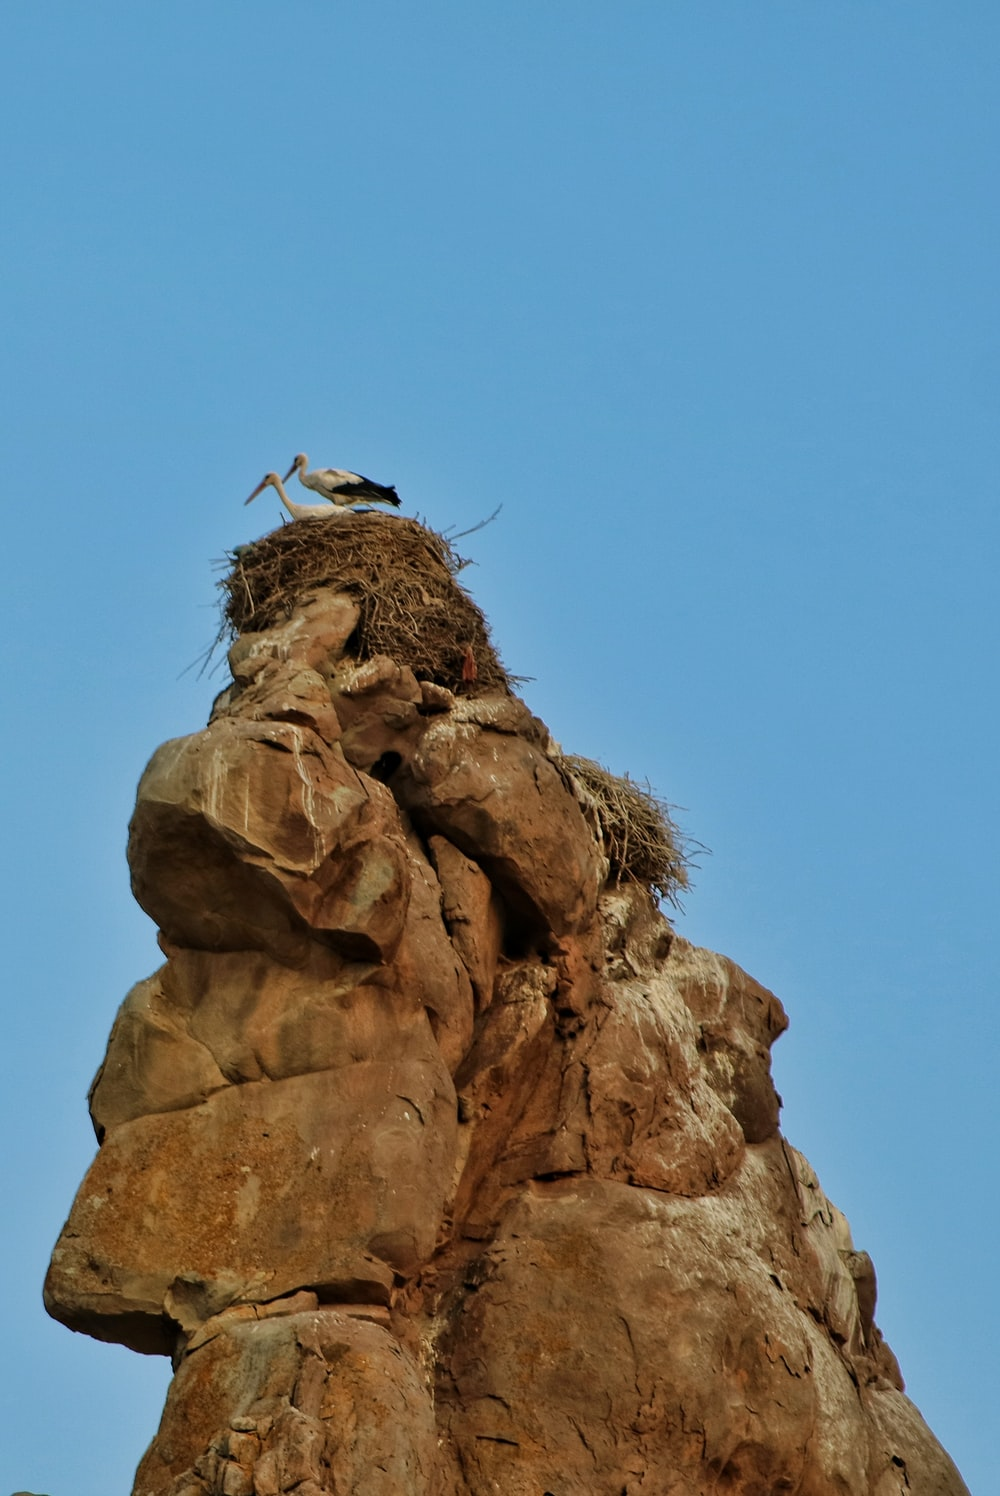 birds on rock with nest